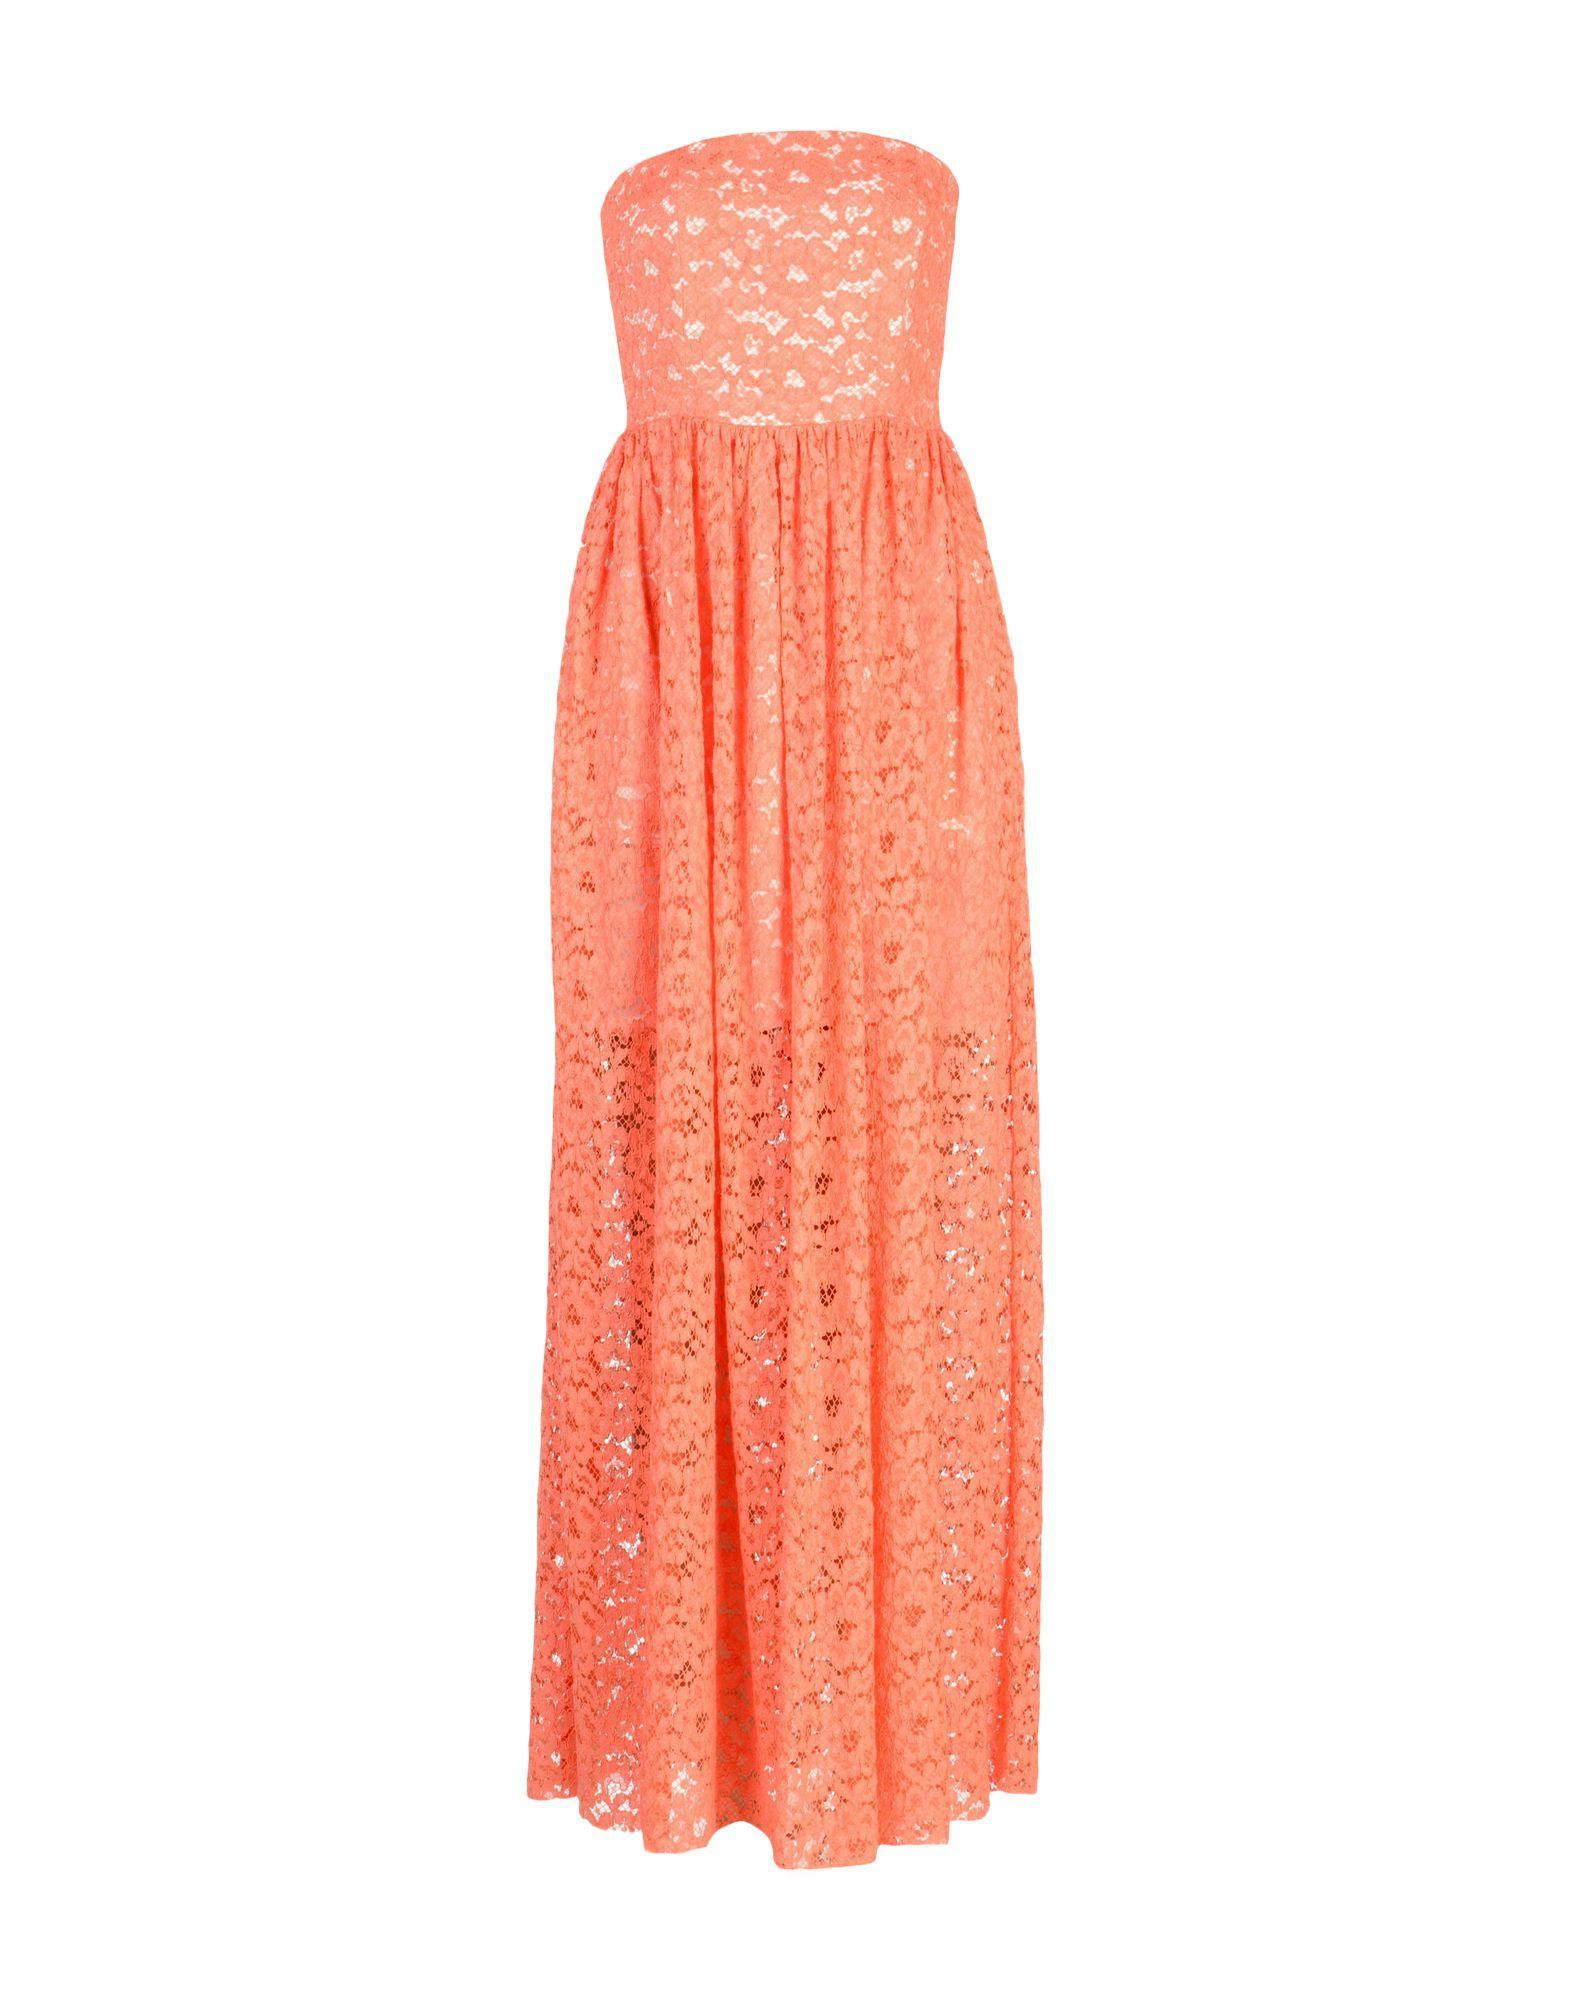 MSGM Salmon Pink Lace Full Length Strapless Dress